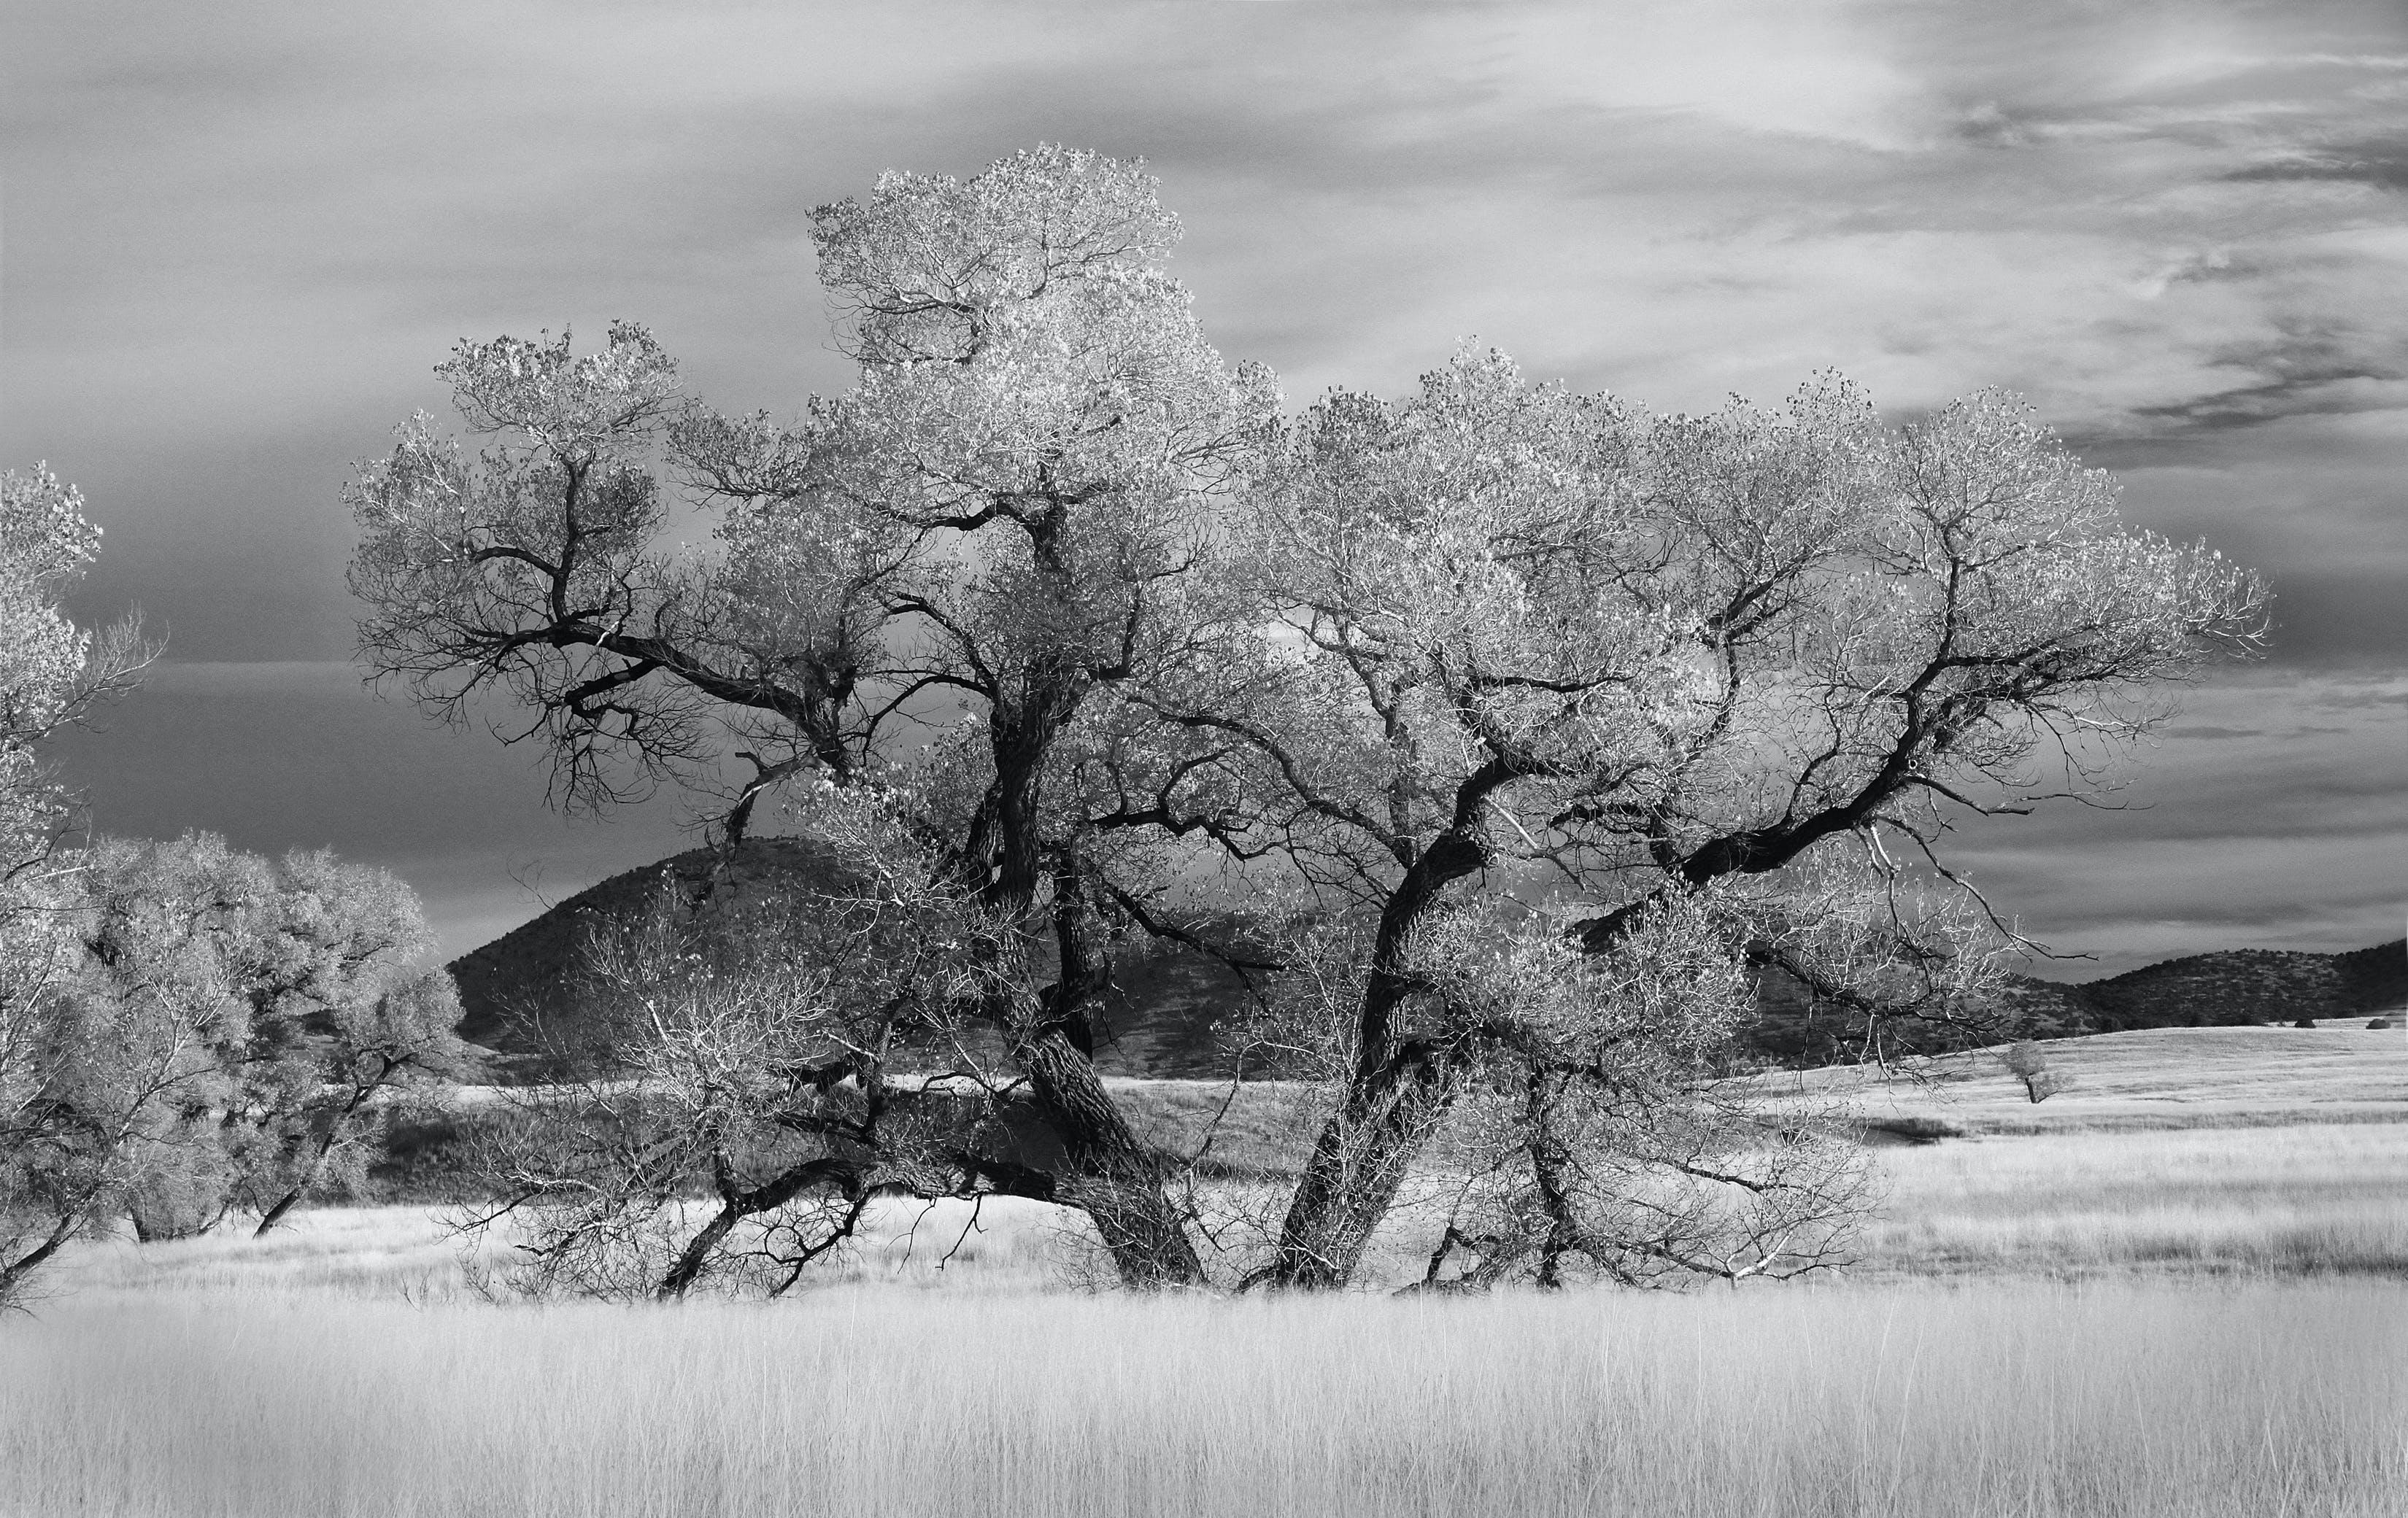 Graysclae of Tree Near Grass